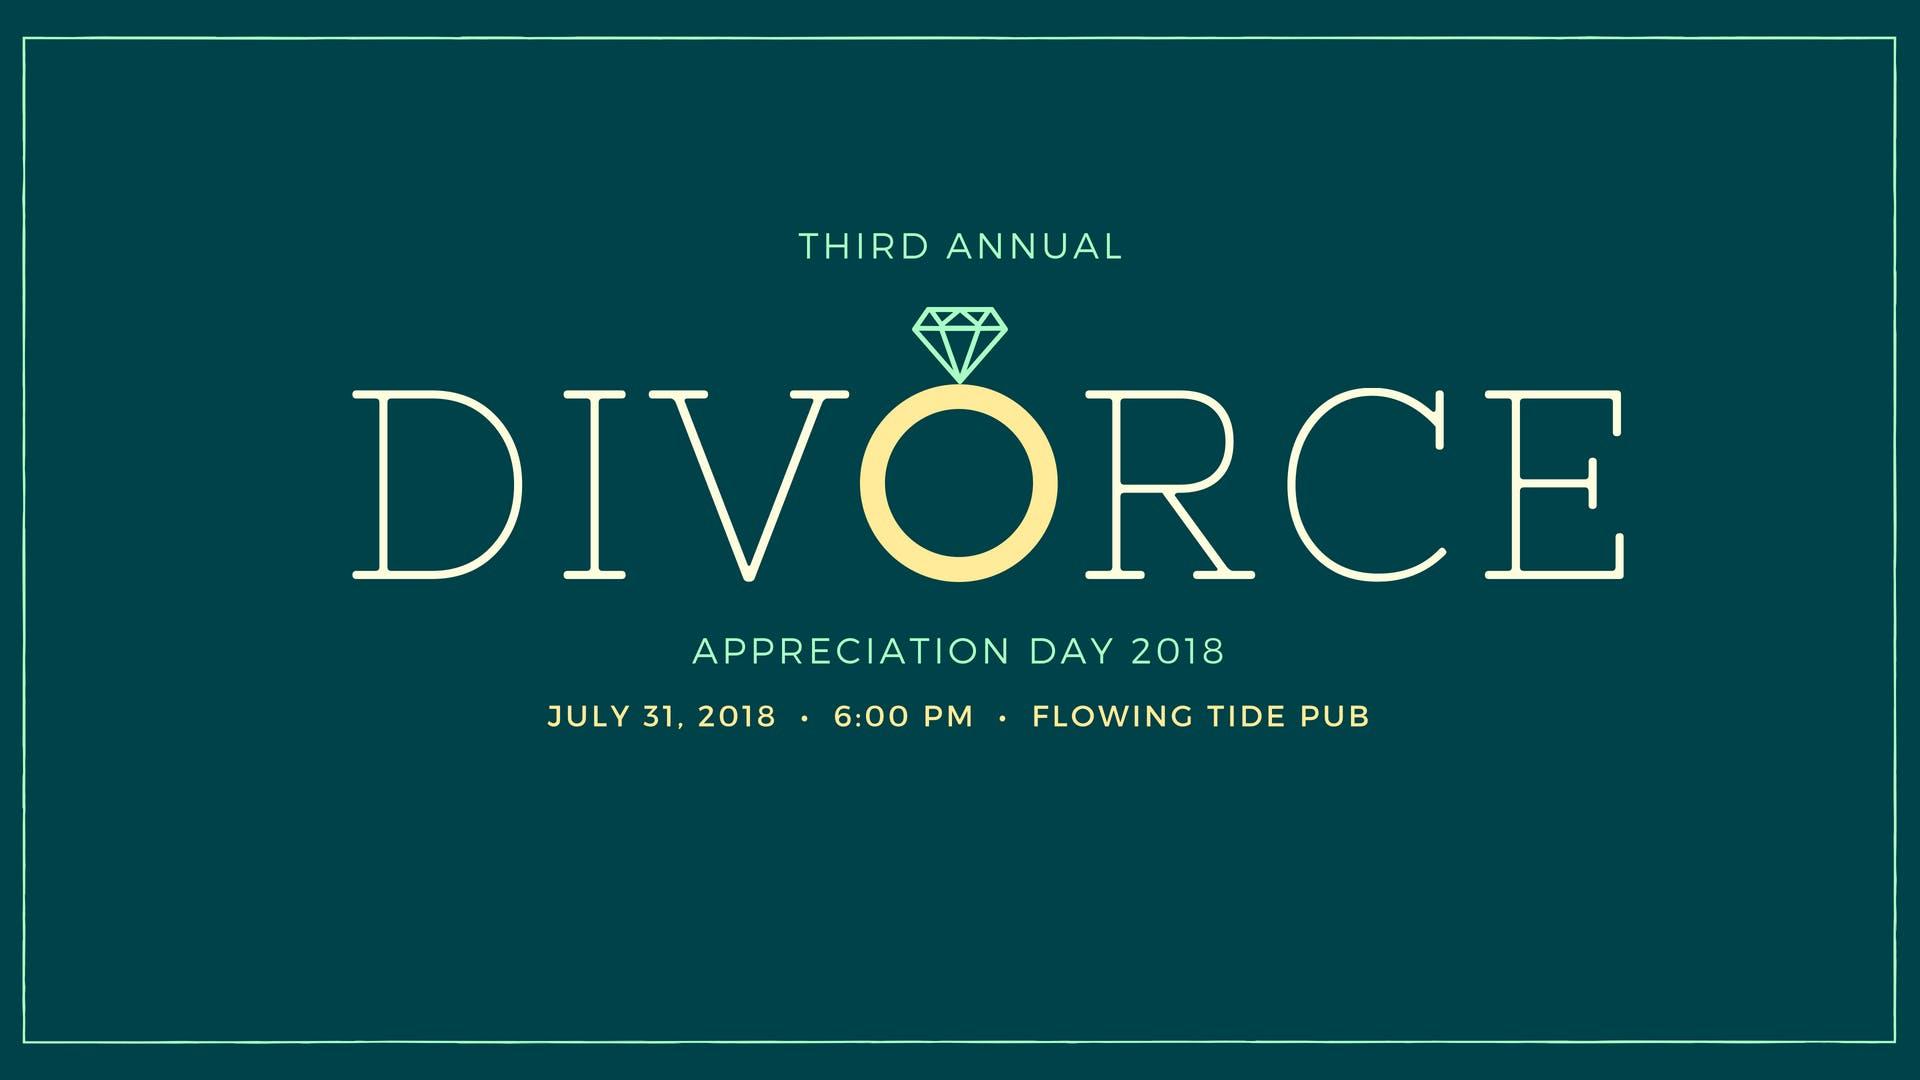 divorce appreciation day cards against humanity 31 jul 2018